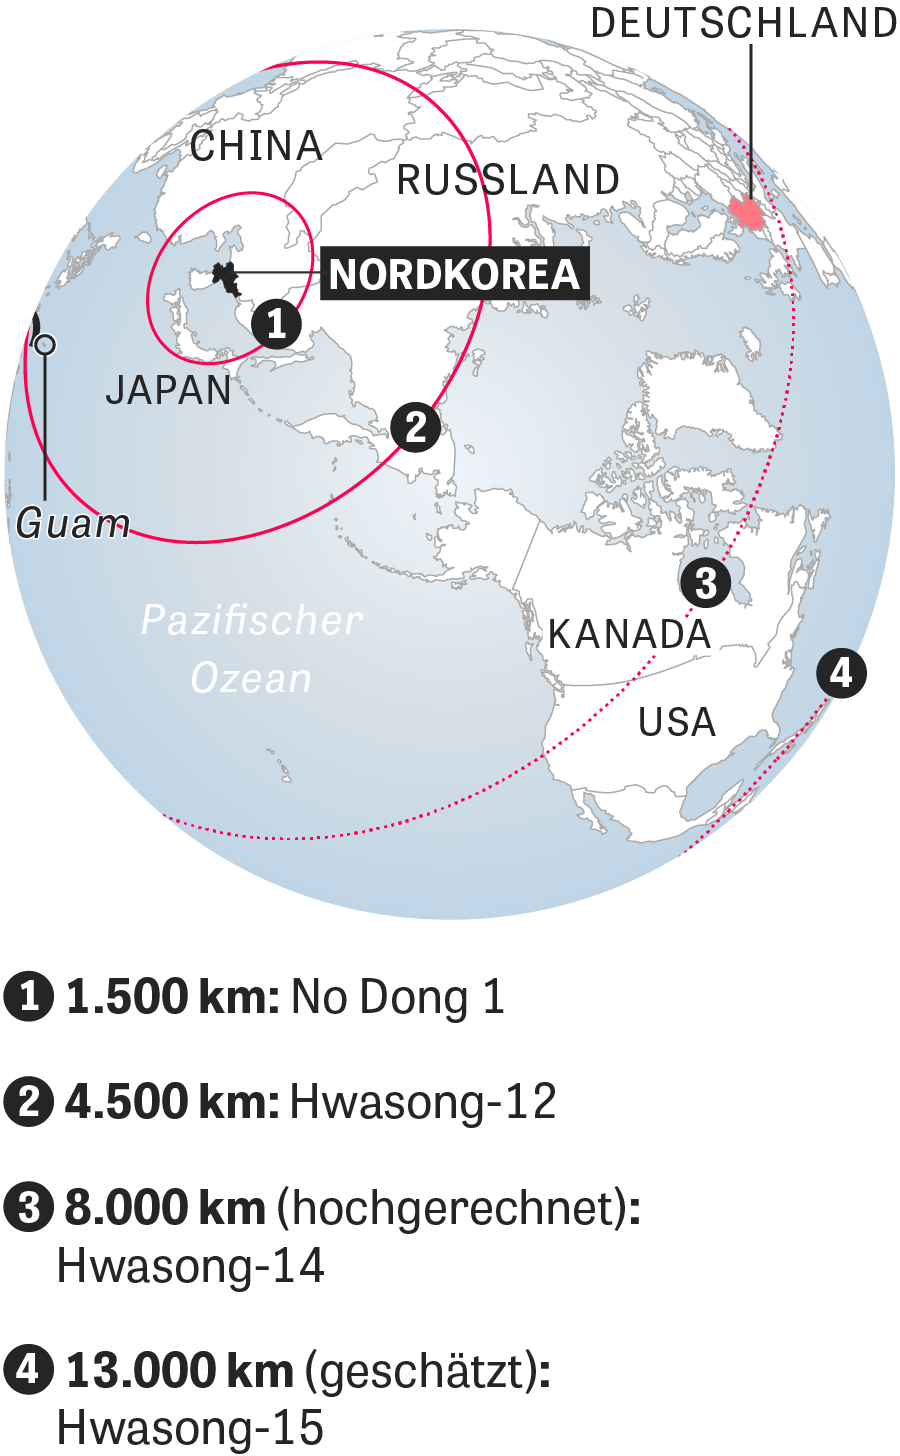 Raketensysteme & Reichweiten Nordkorea